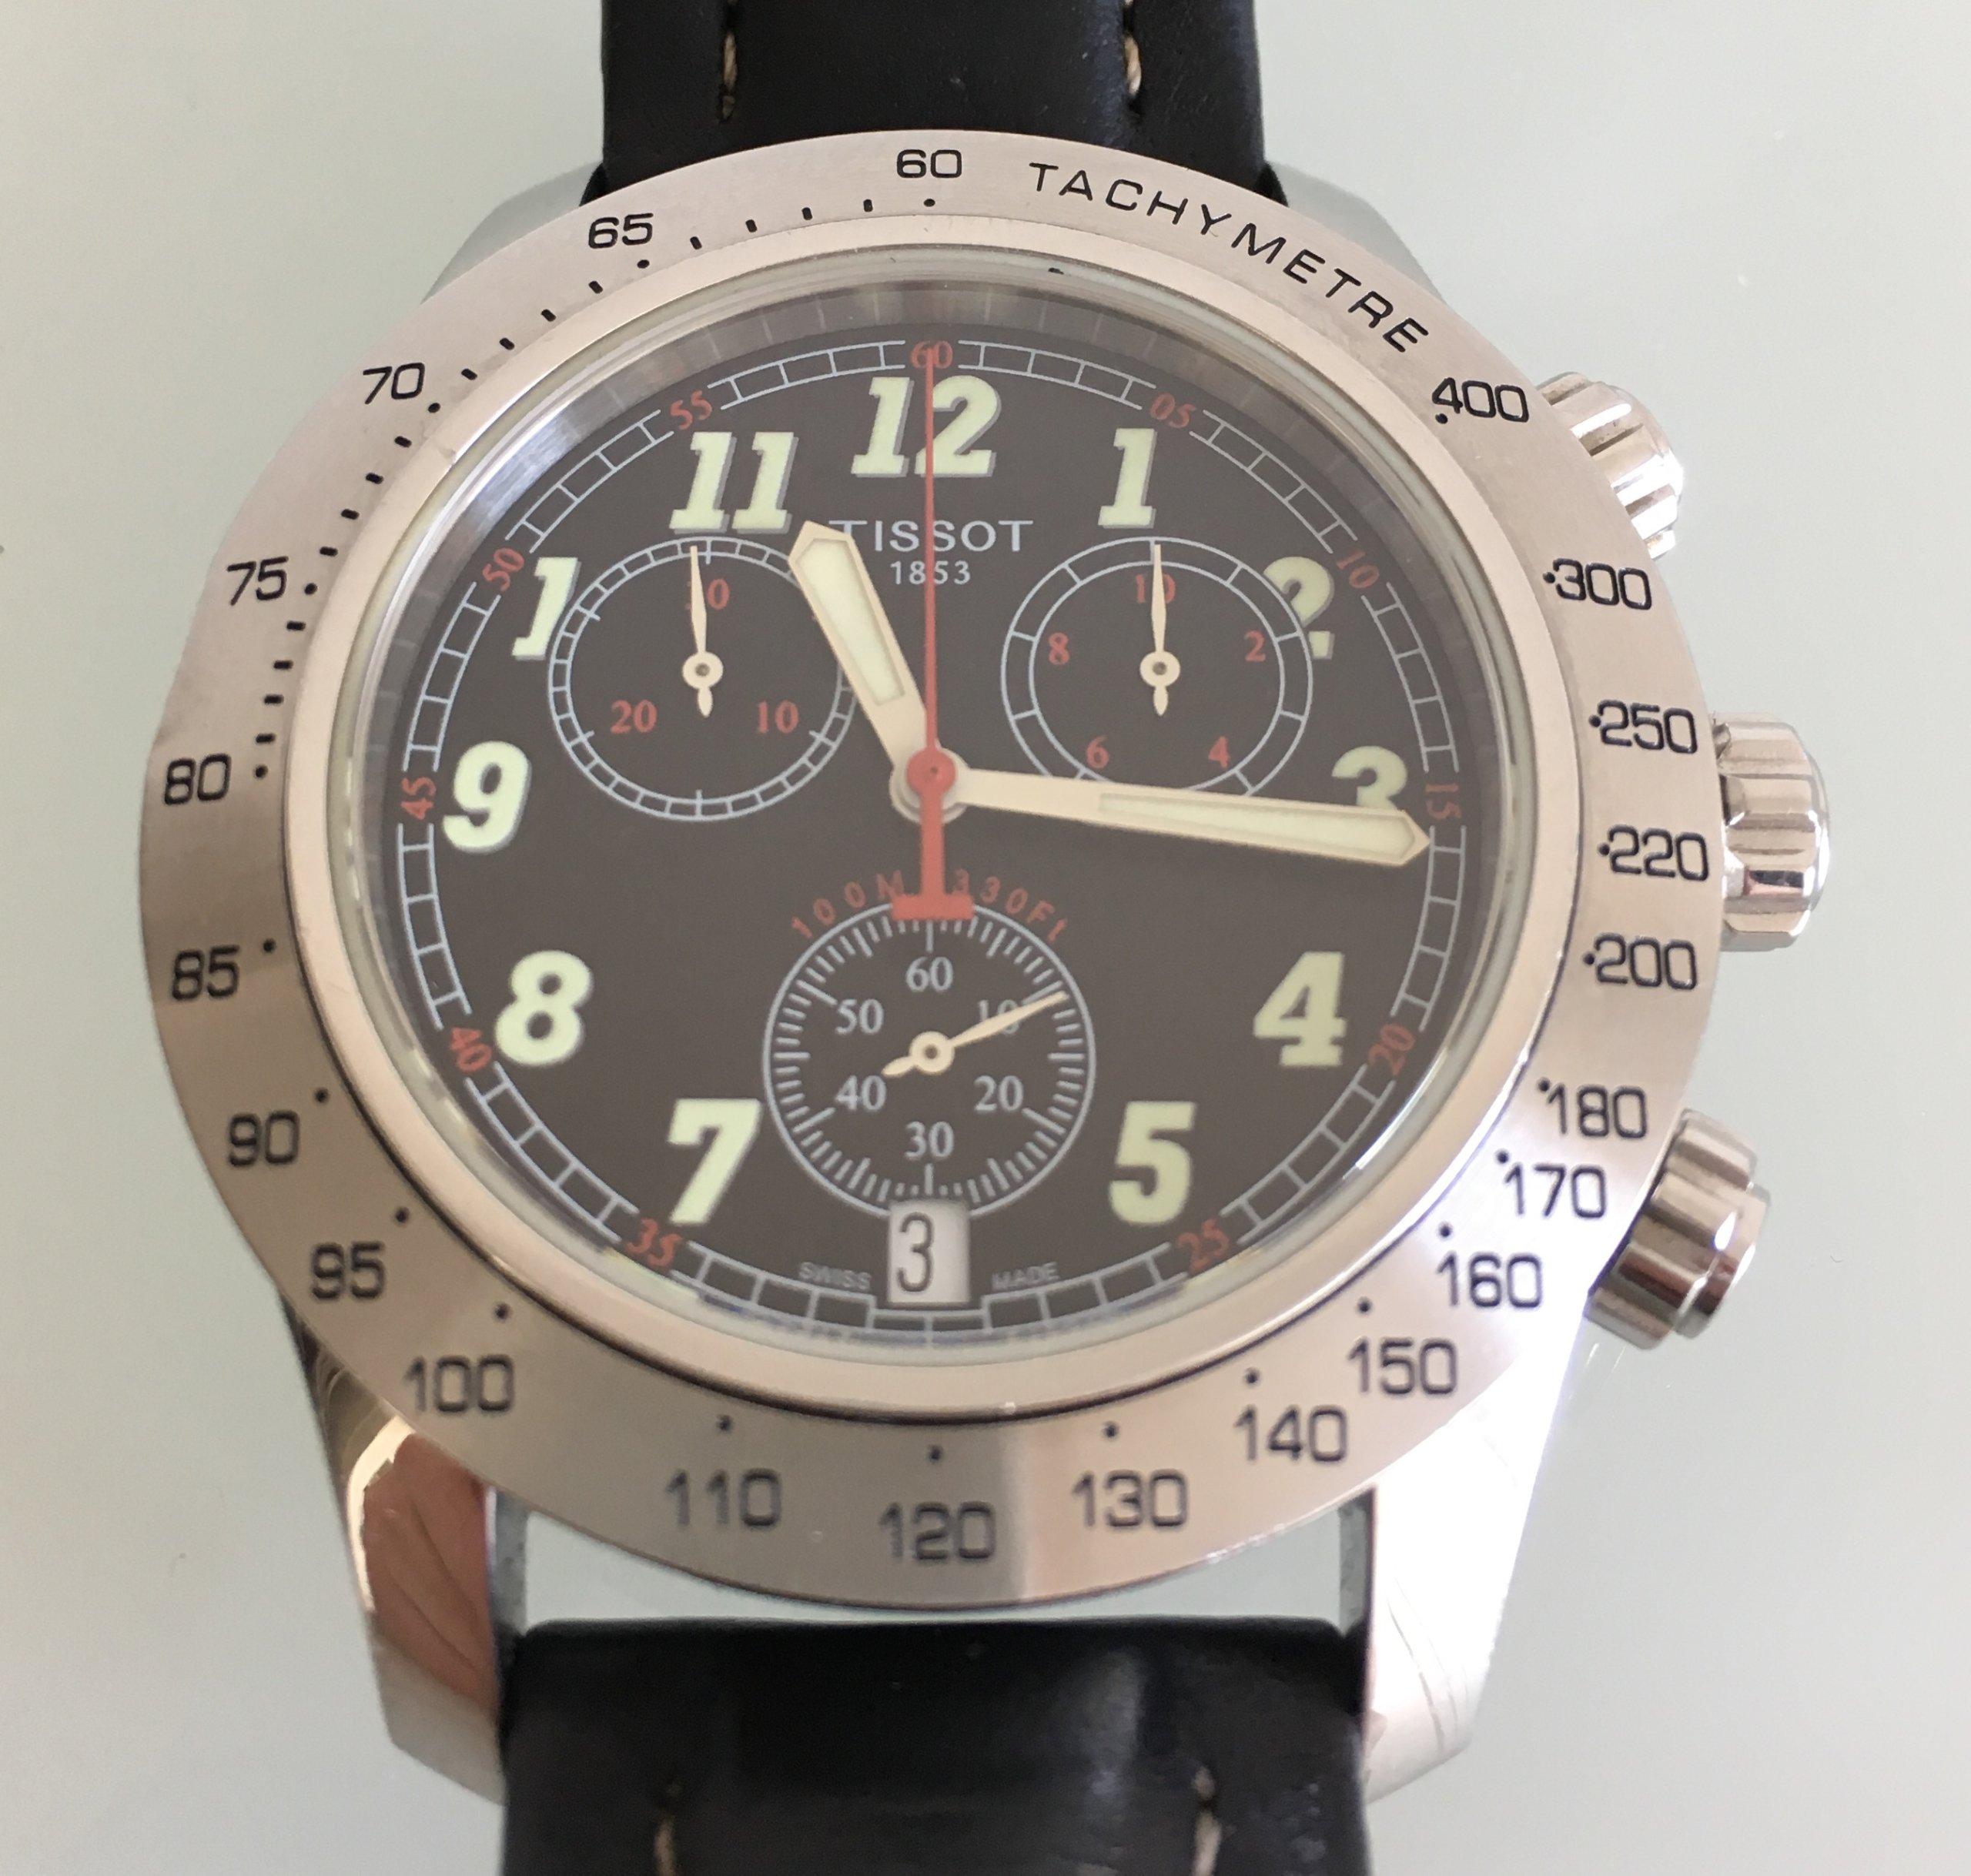 Tissot V8 zegarek z chronografem - TANIO